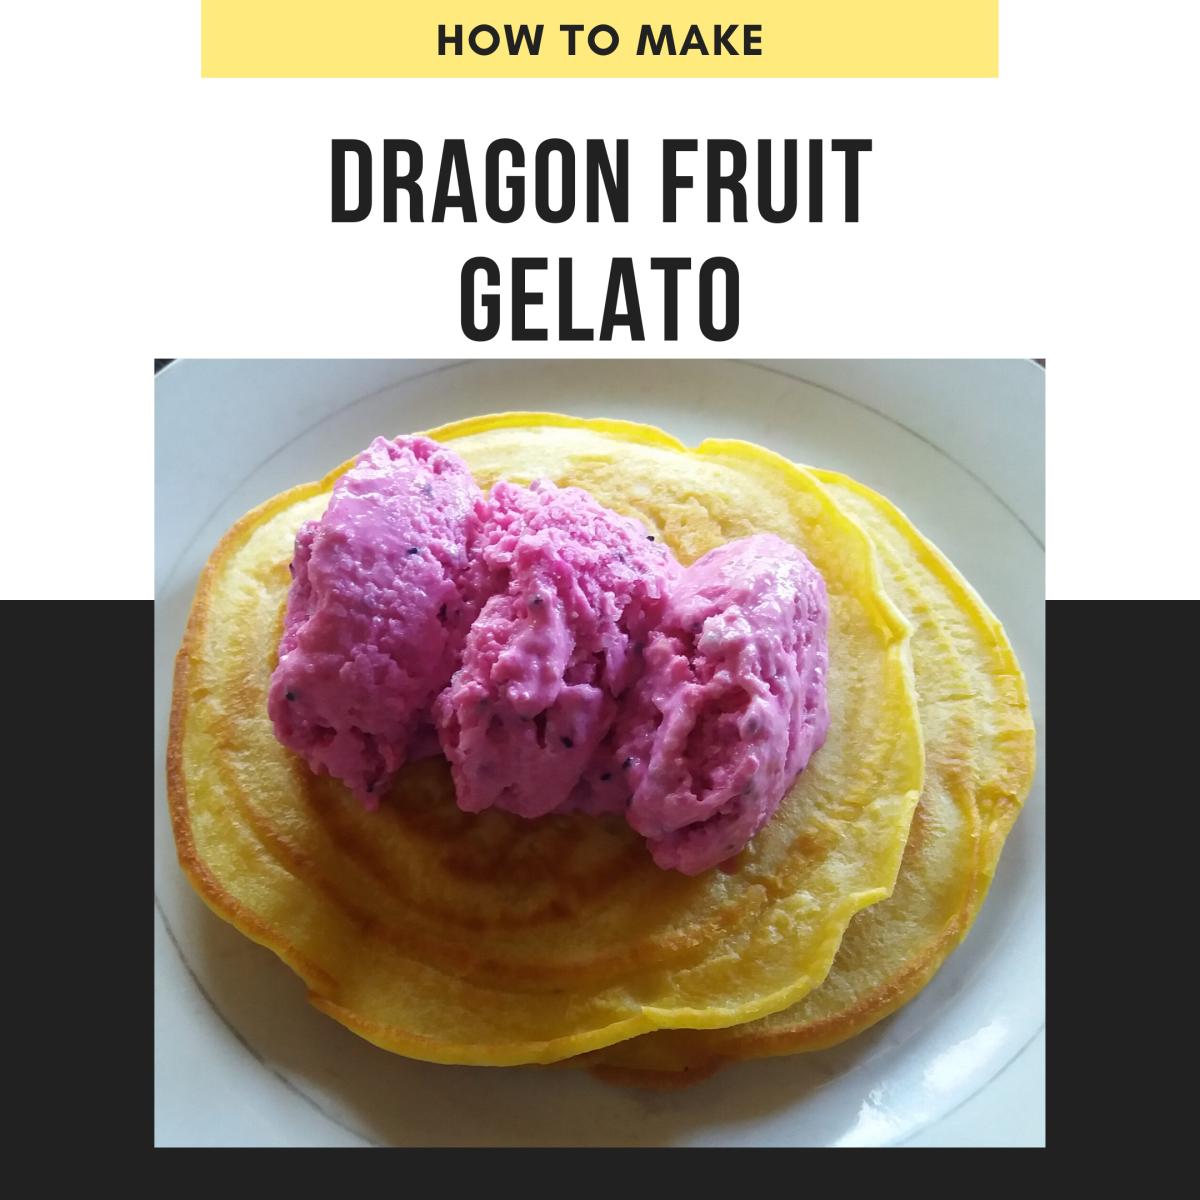 How to Make No-Churn Dragon Fruit Gelato